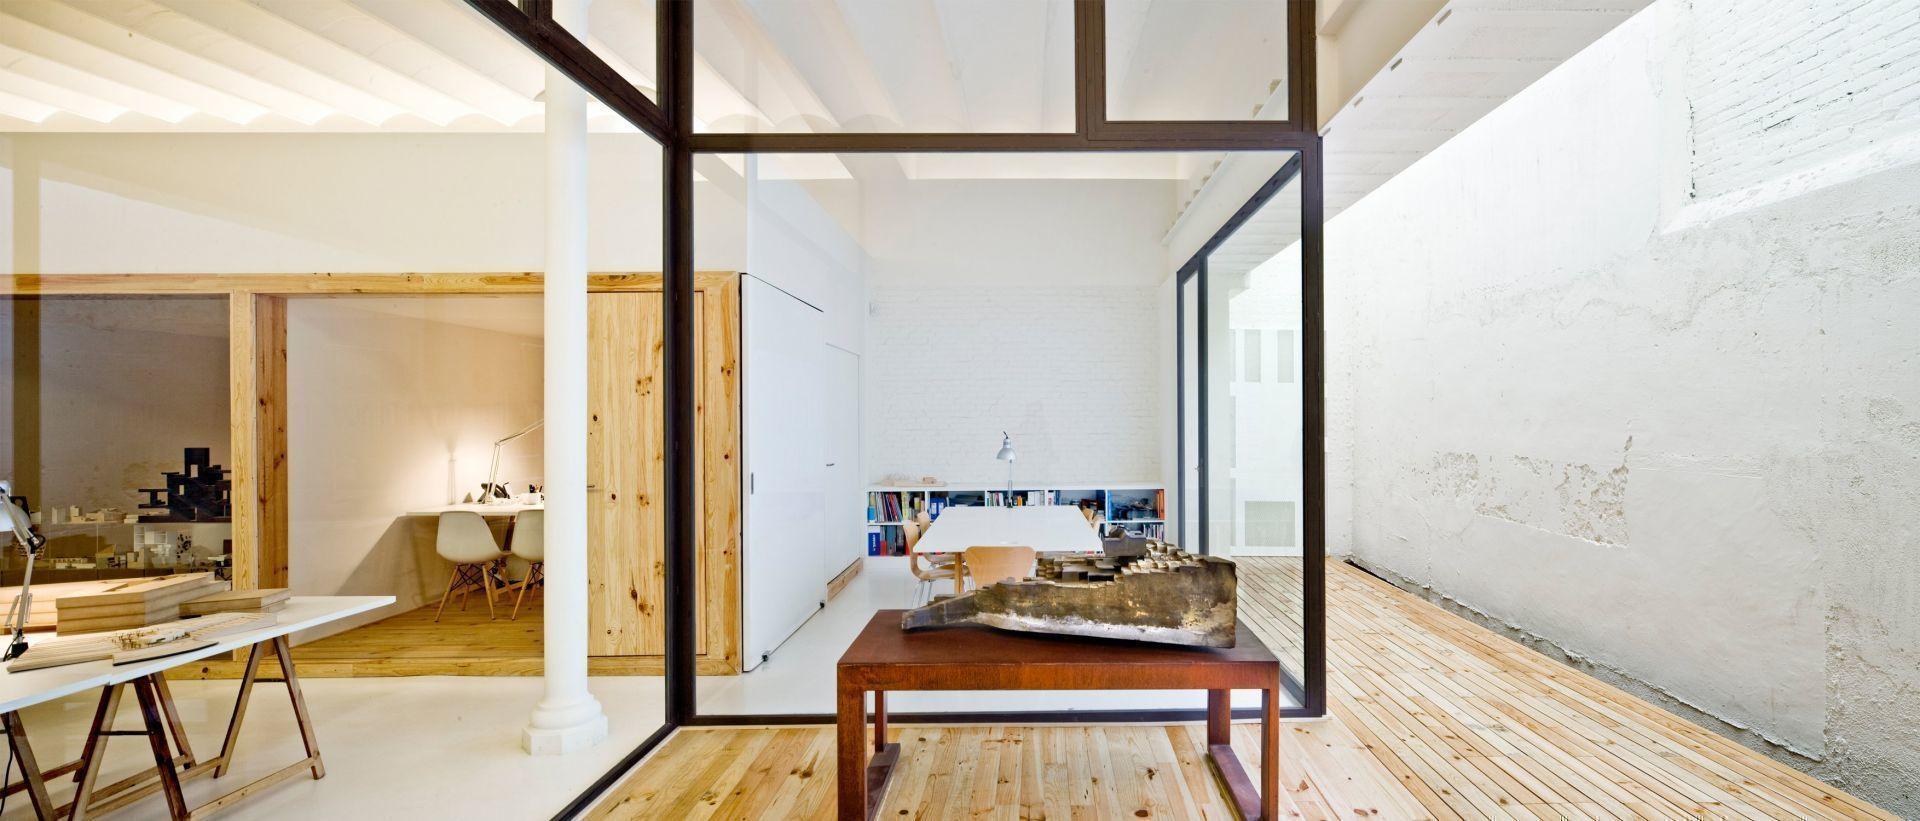 Estudio de dise o multidisciplinar en barcelona arqa - Estudios de interiorismo en barcelona ...